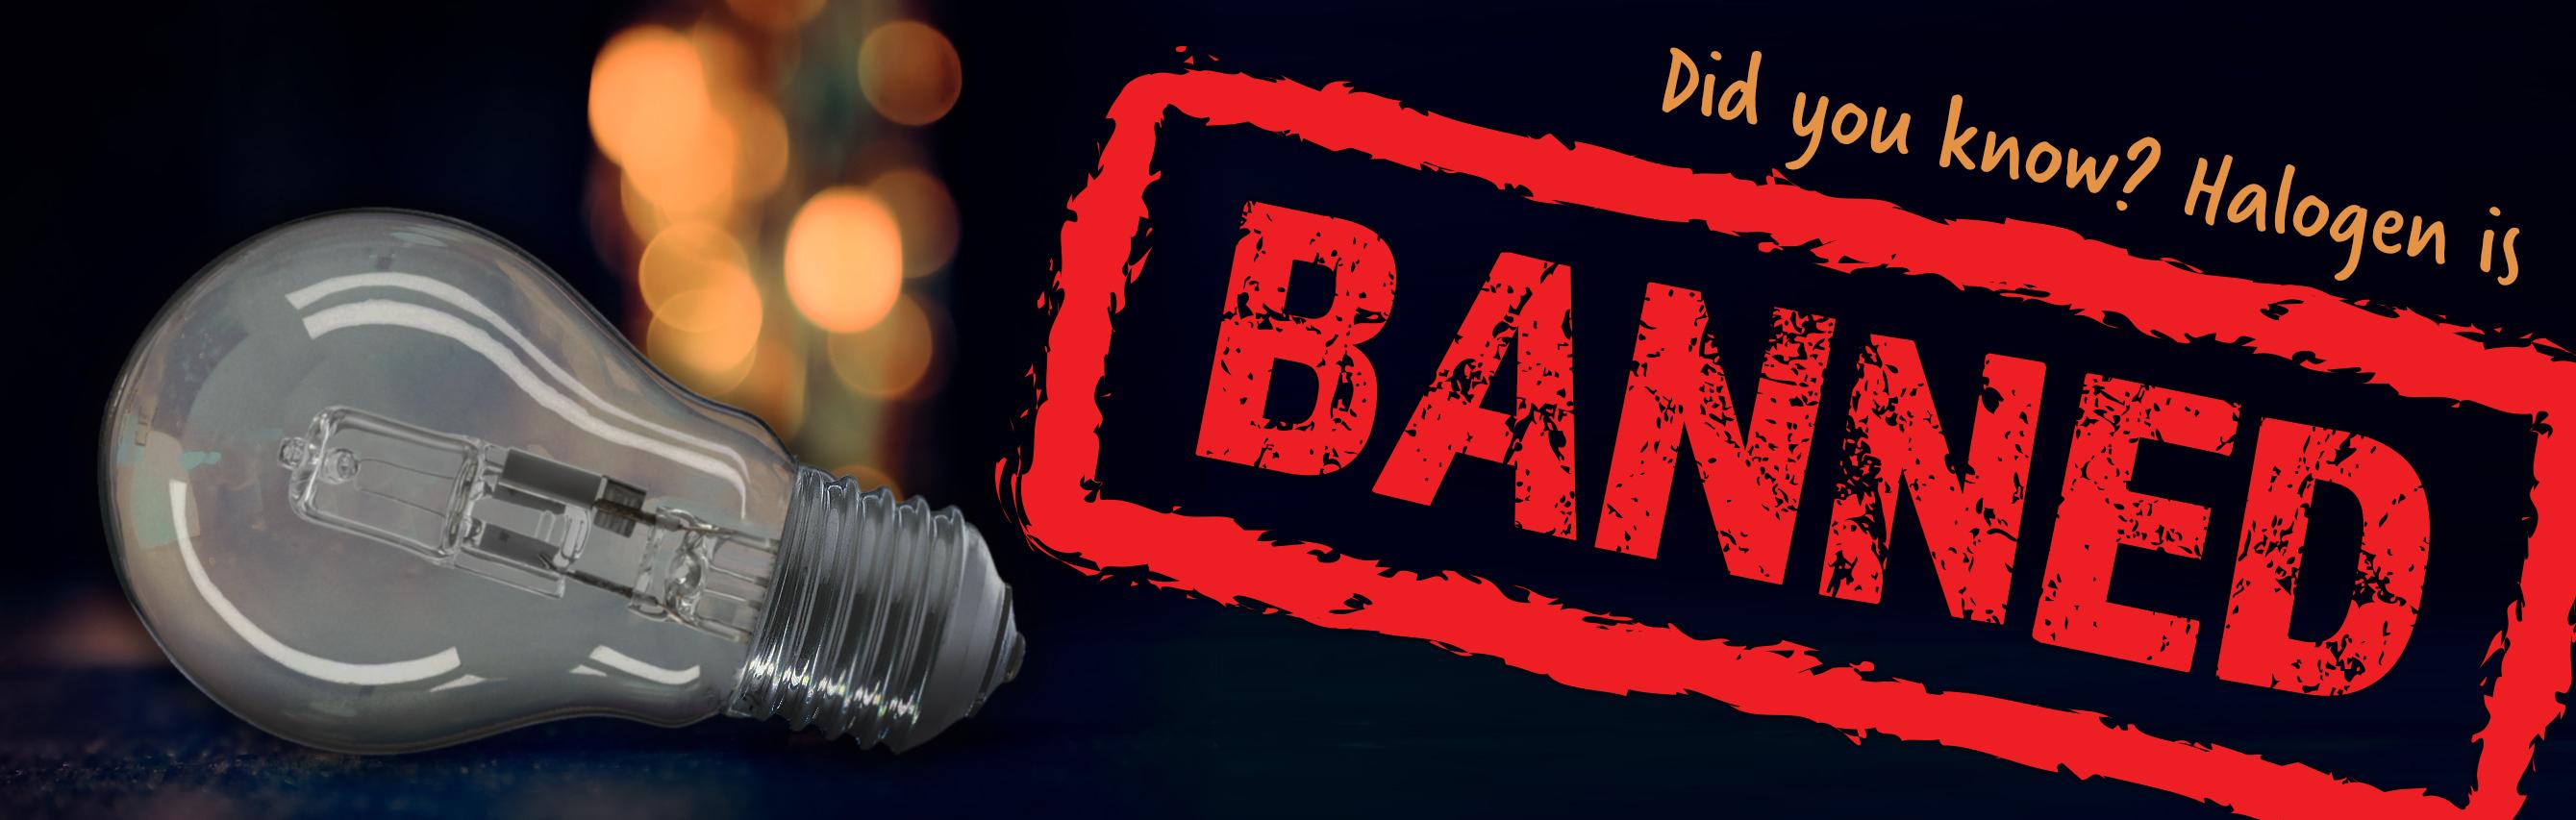 Halogen Ban